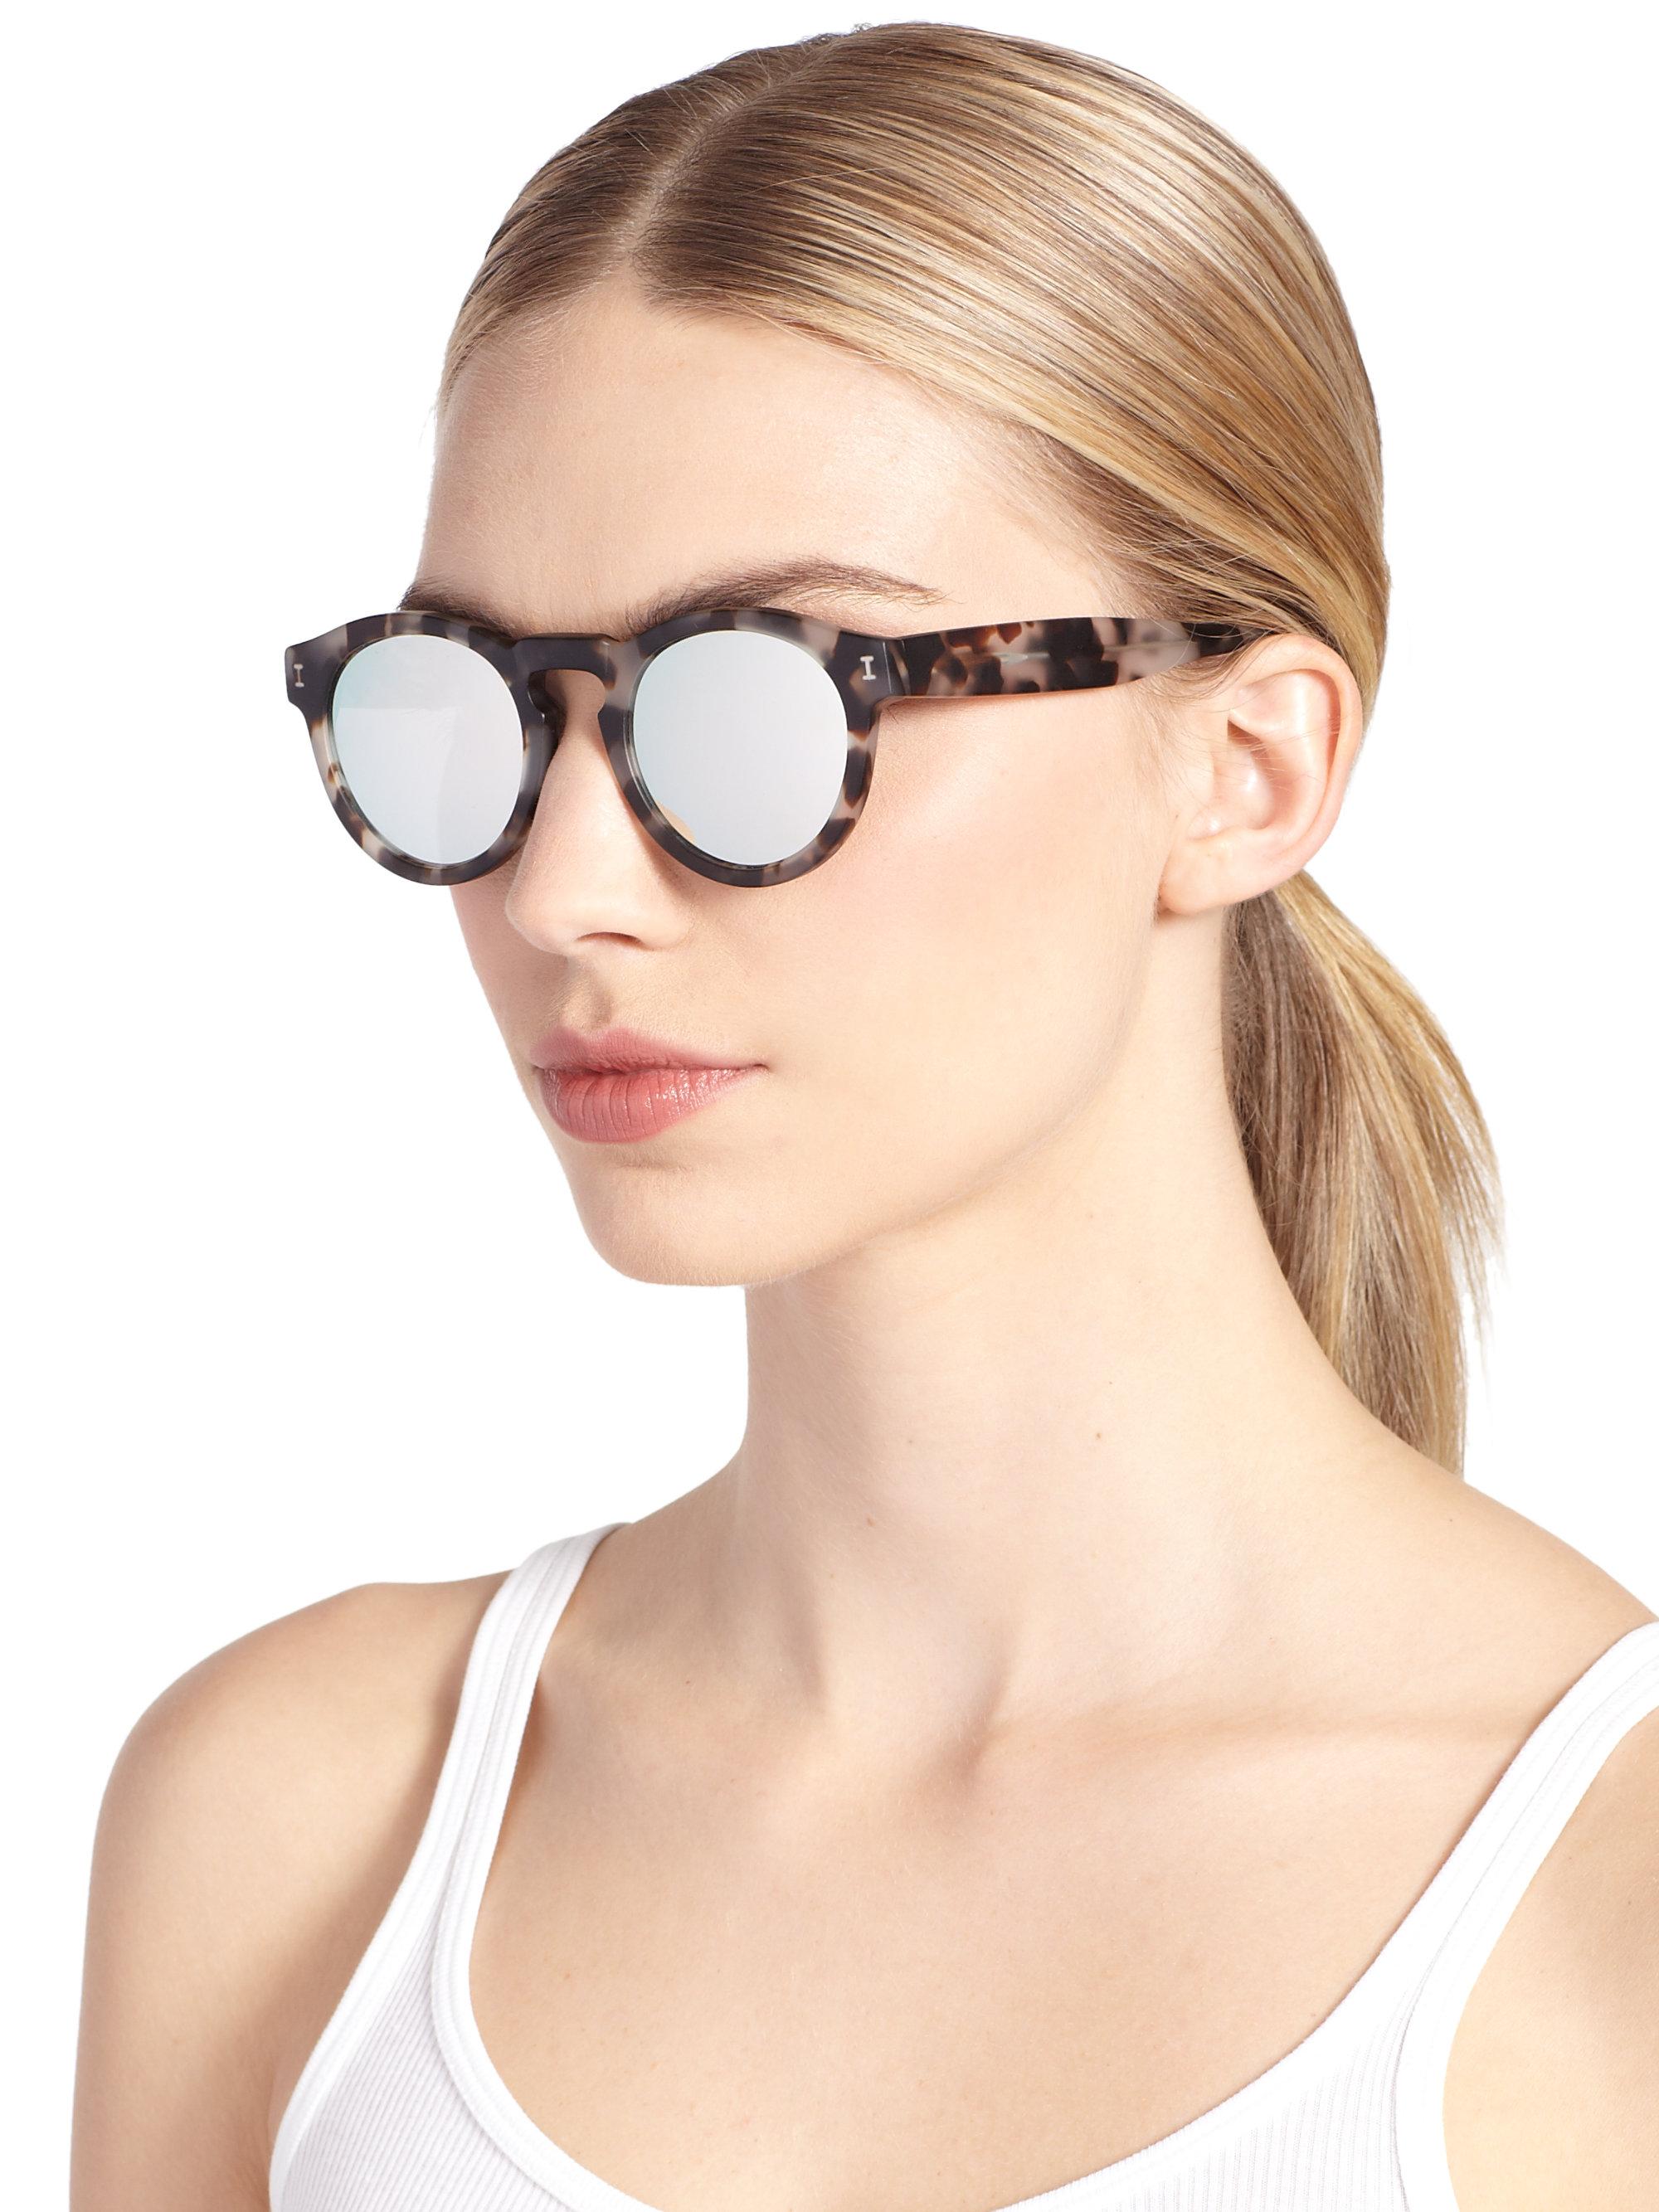 10c1018853c Illesteva Leonard Mirrored Sunglasses - Bitterroot Public Library